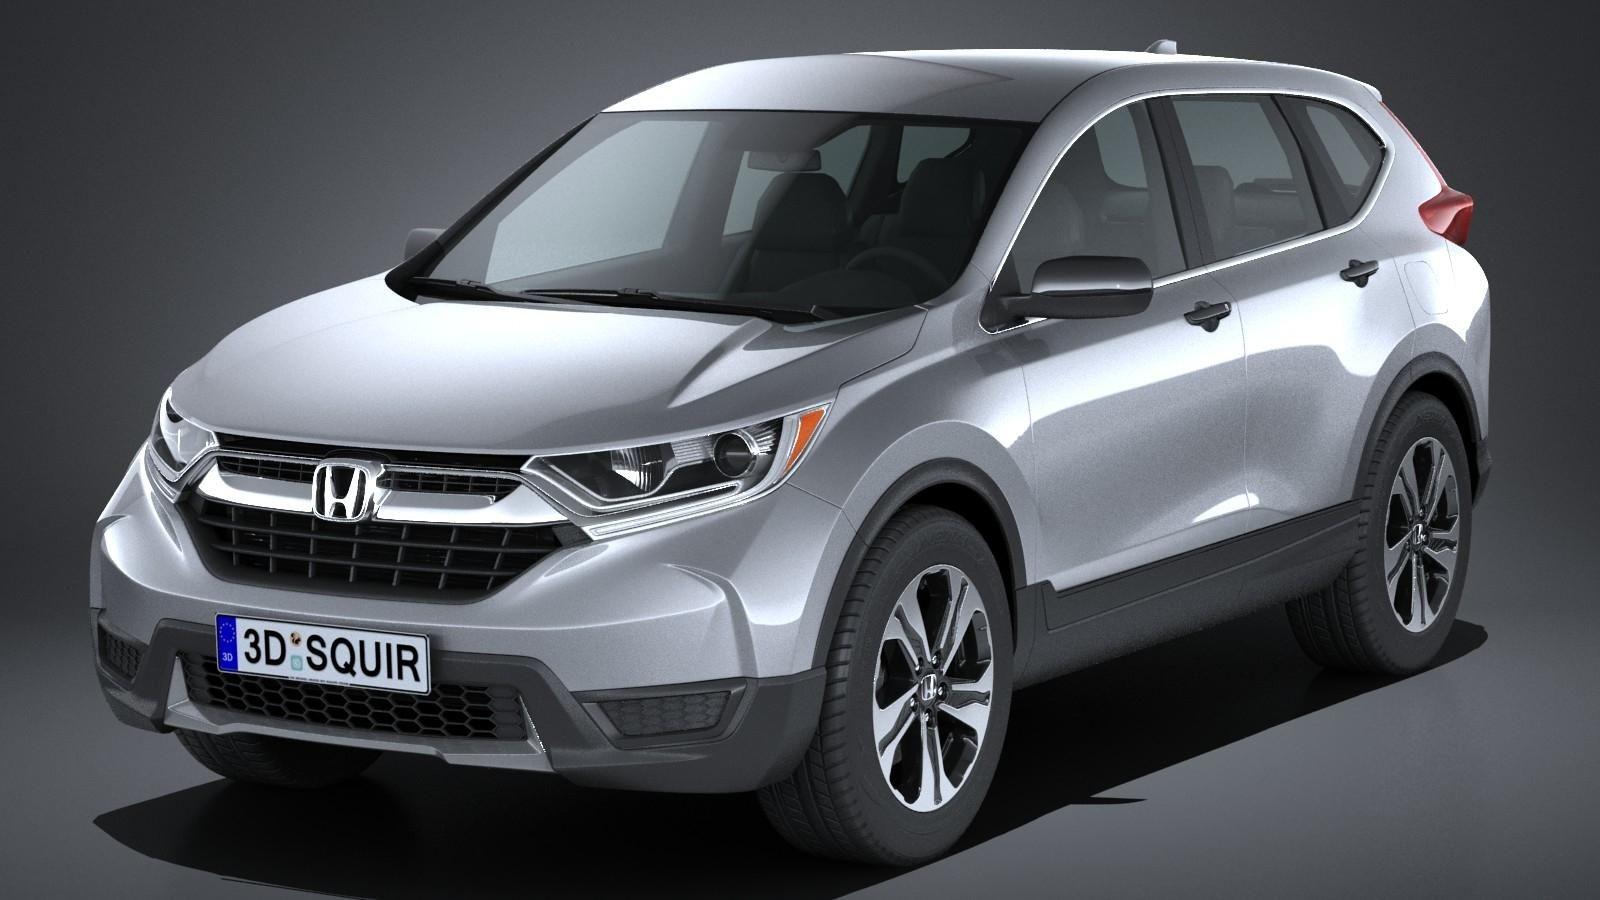 Honda CRV LX 2017 3D Model AD ,CRHondaLXModel